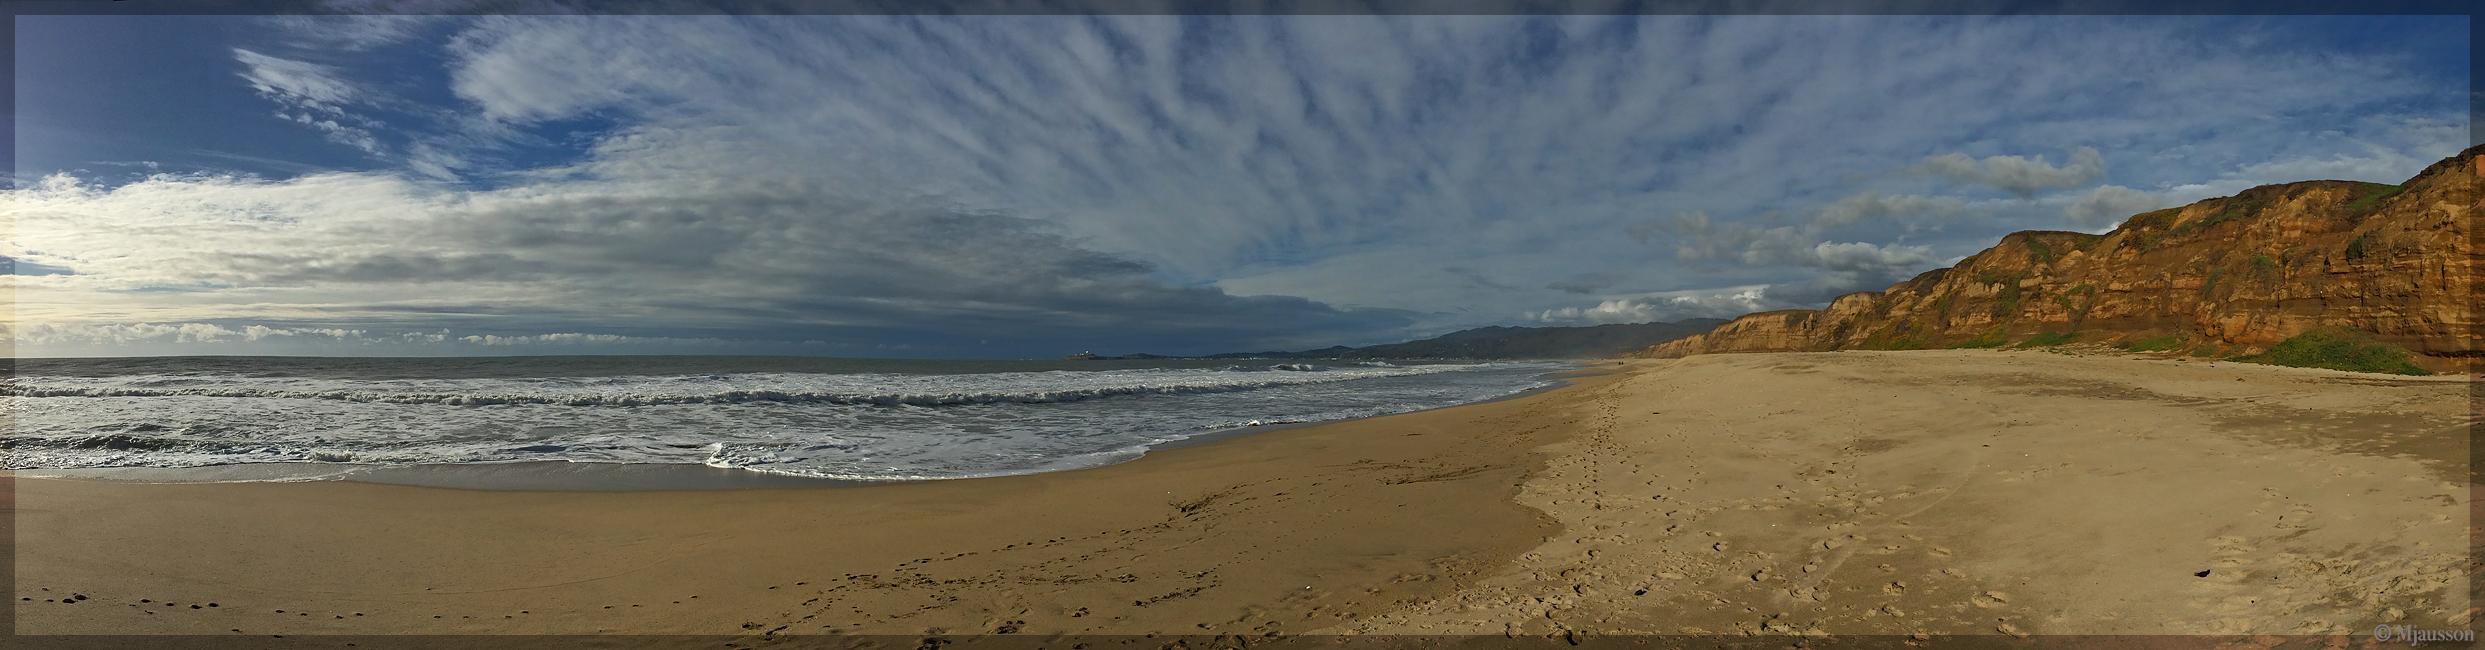 Half Moon Bay Panorama 1